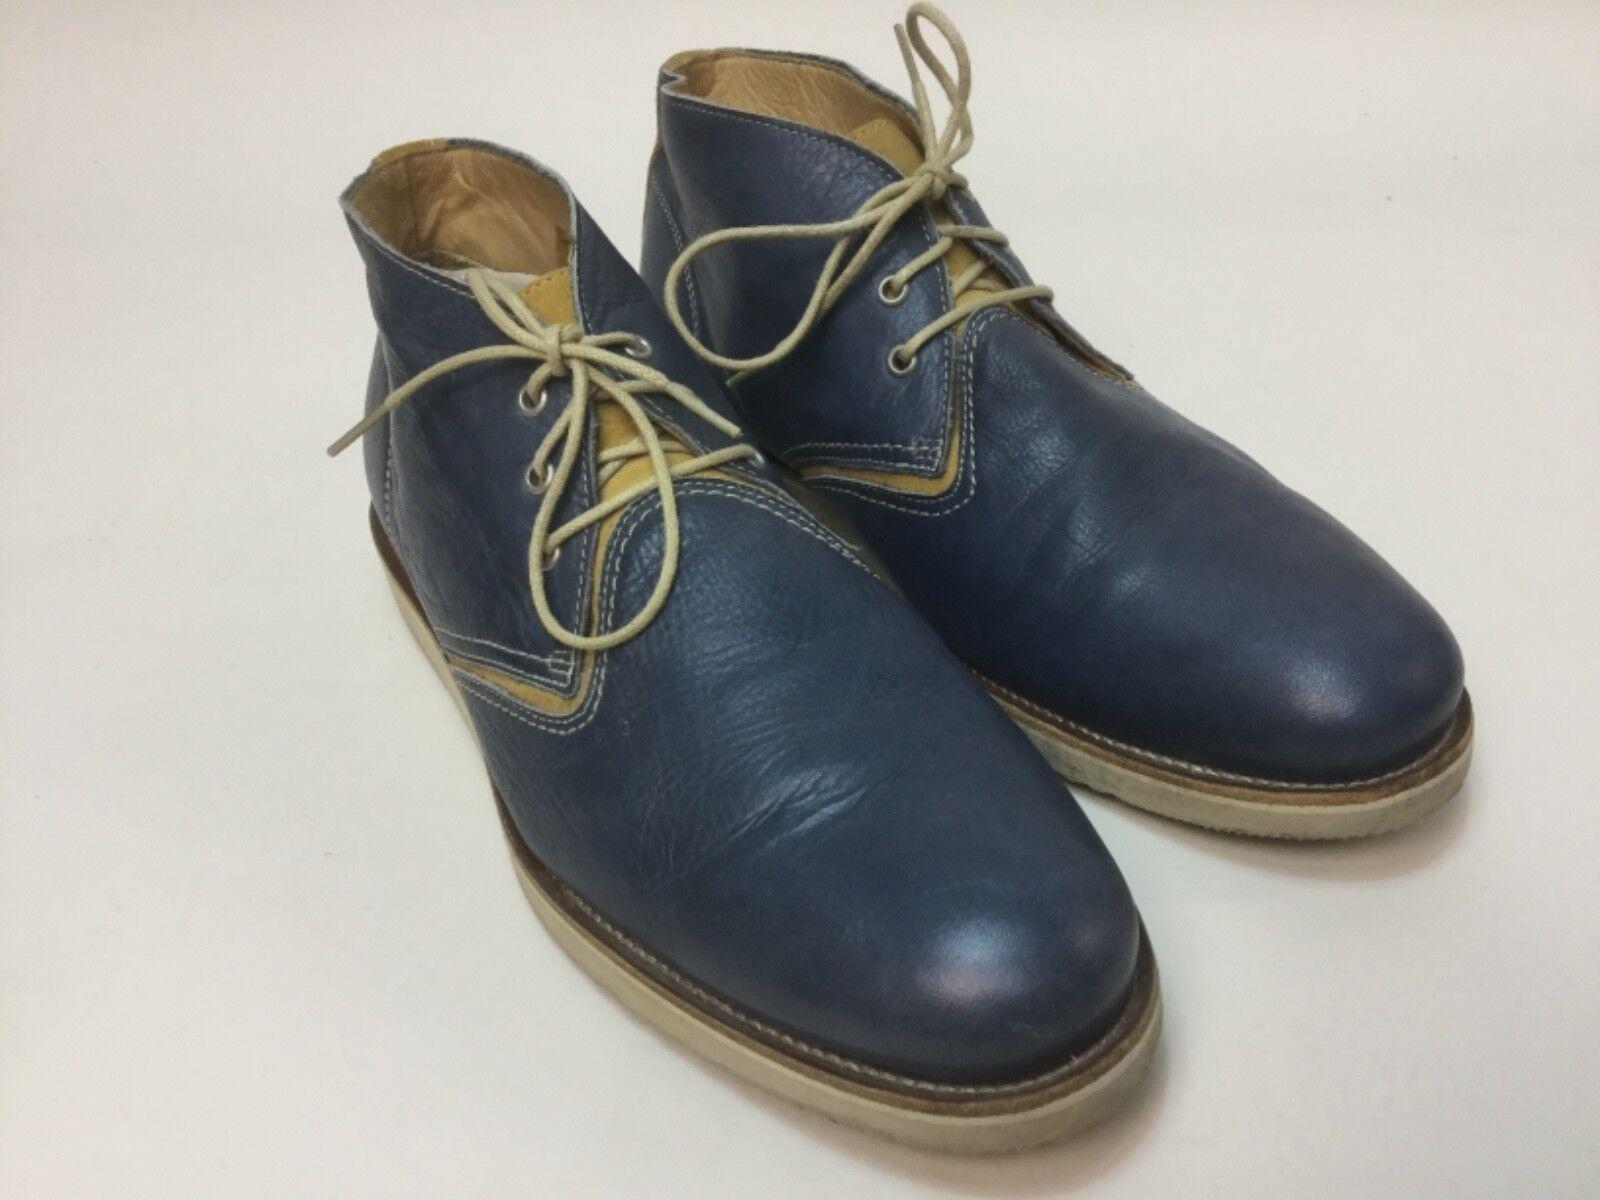 vendita di offerte Used  495 Uomo FACONNABLE blu Denim leather leather leather sz US 12   Uk 45 dress stivali scarpe  spedizione gratuita